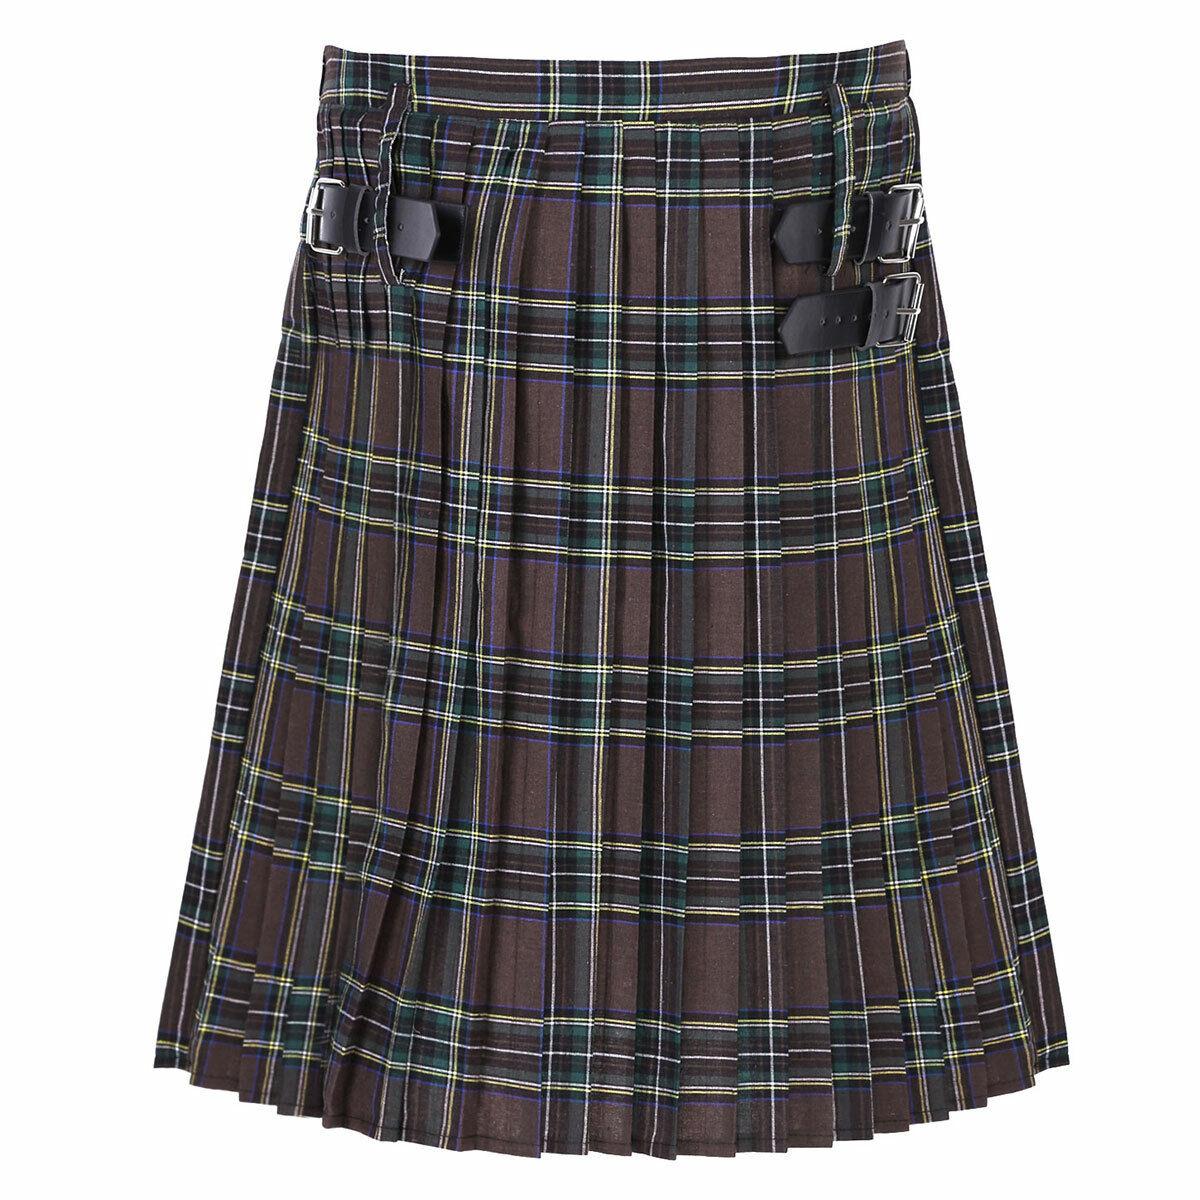 Mens Scottish Traditional Highland Dress Tartan Kilts Pleated Skirt Costume